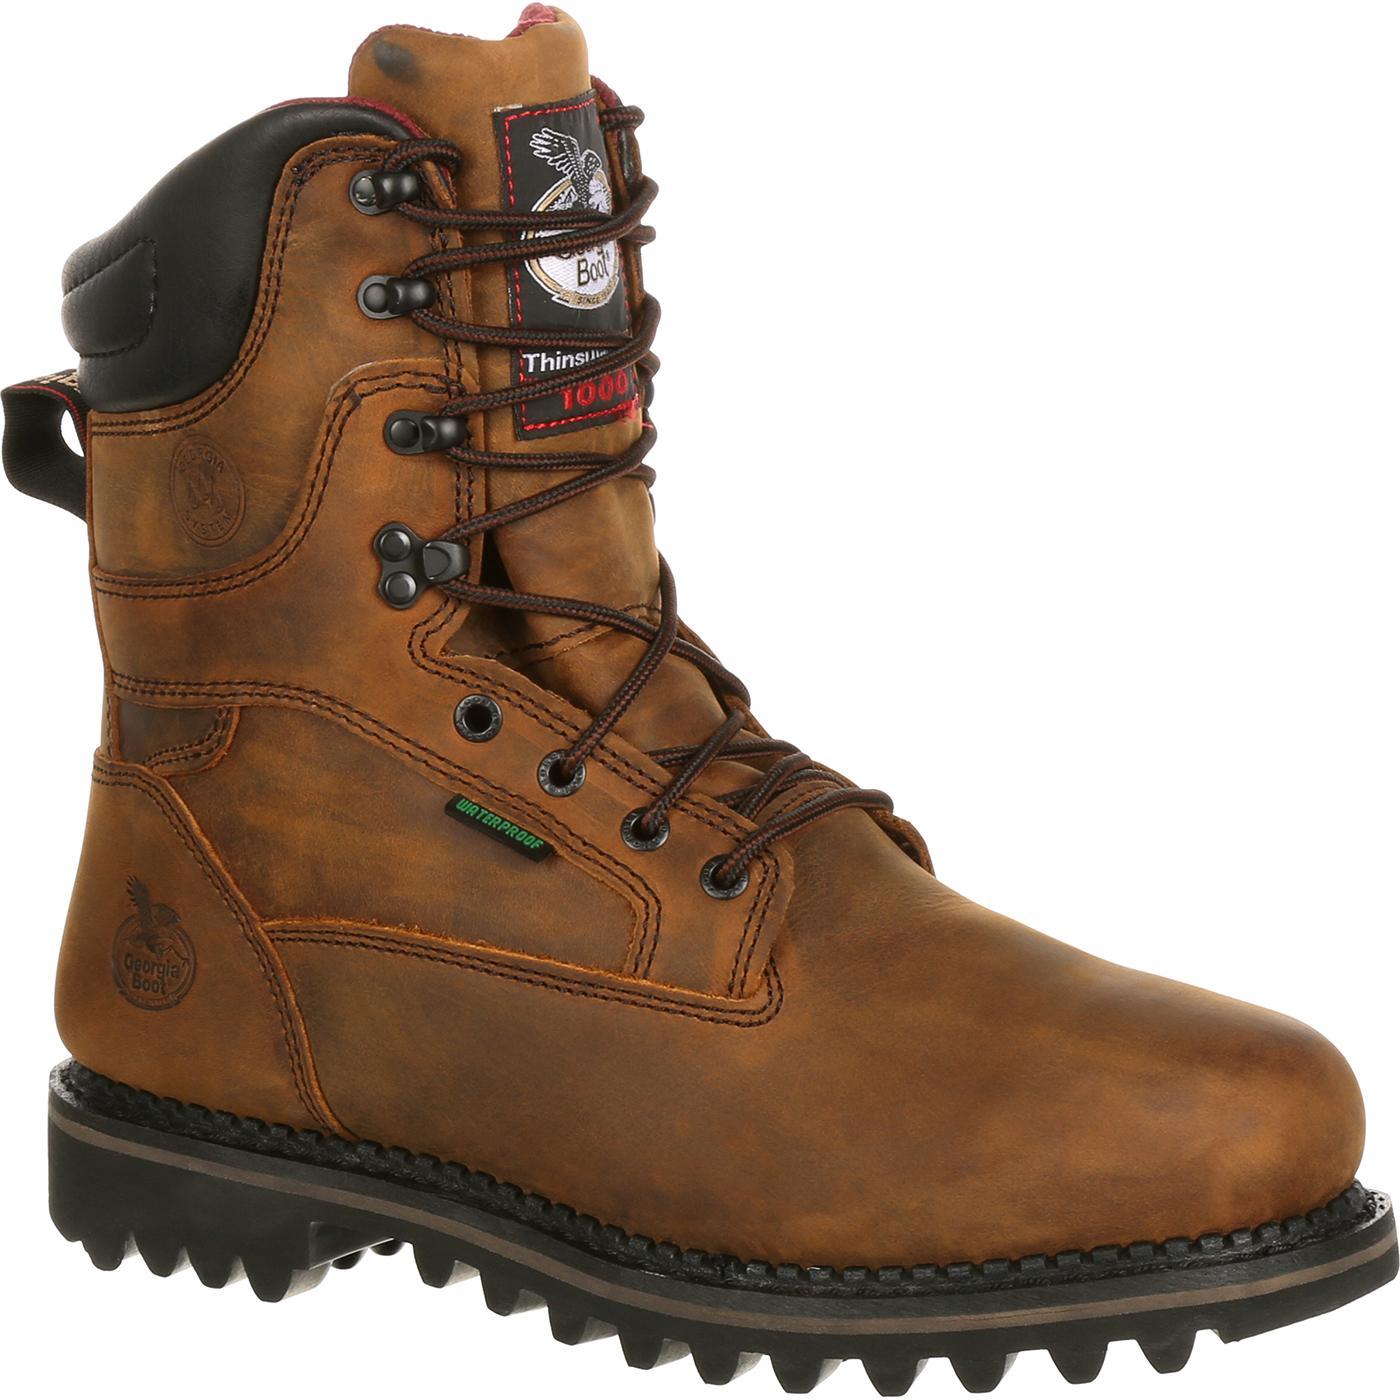 Men's Georgia Insulated Steel Toe Work Boots, #G8362